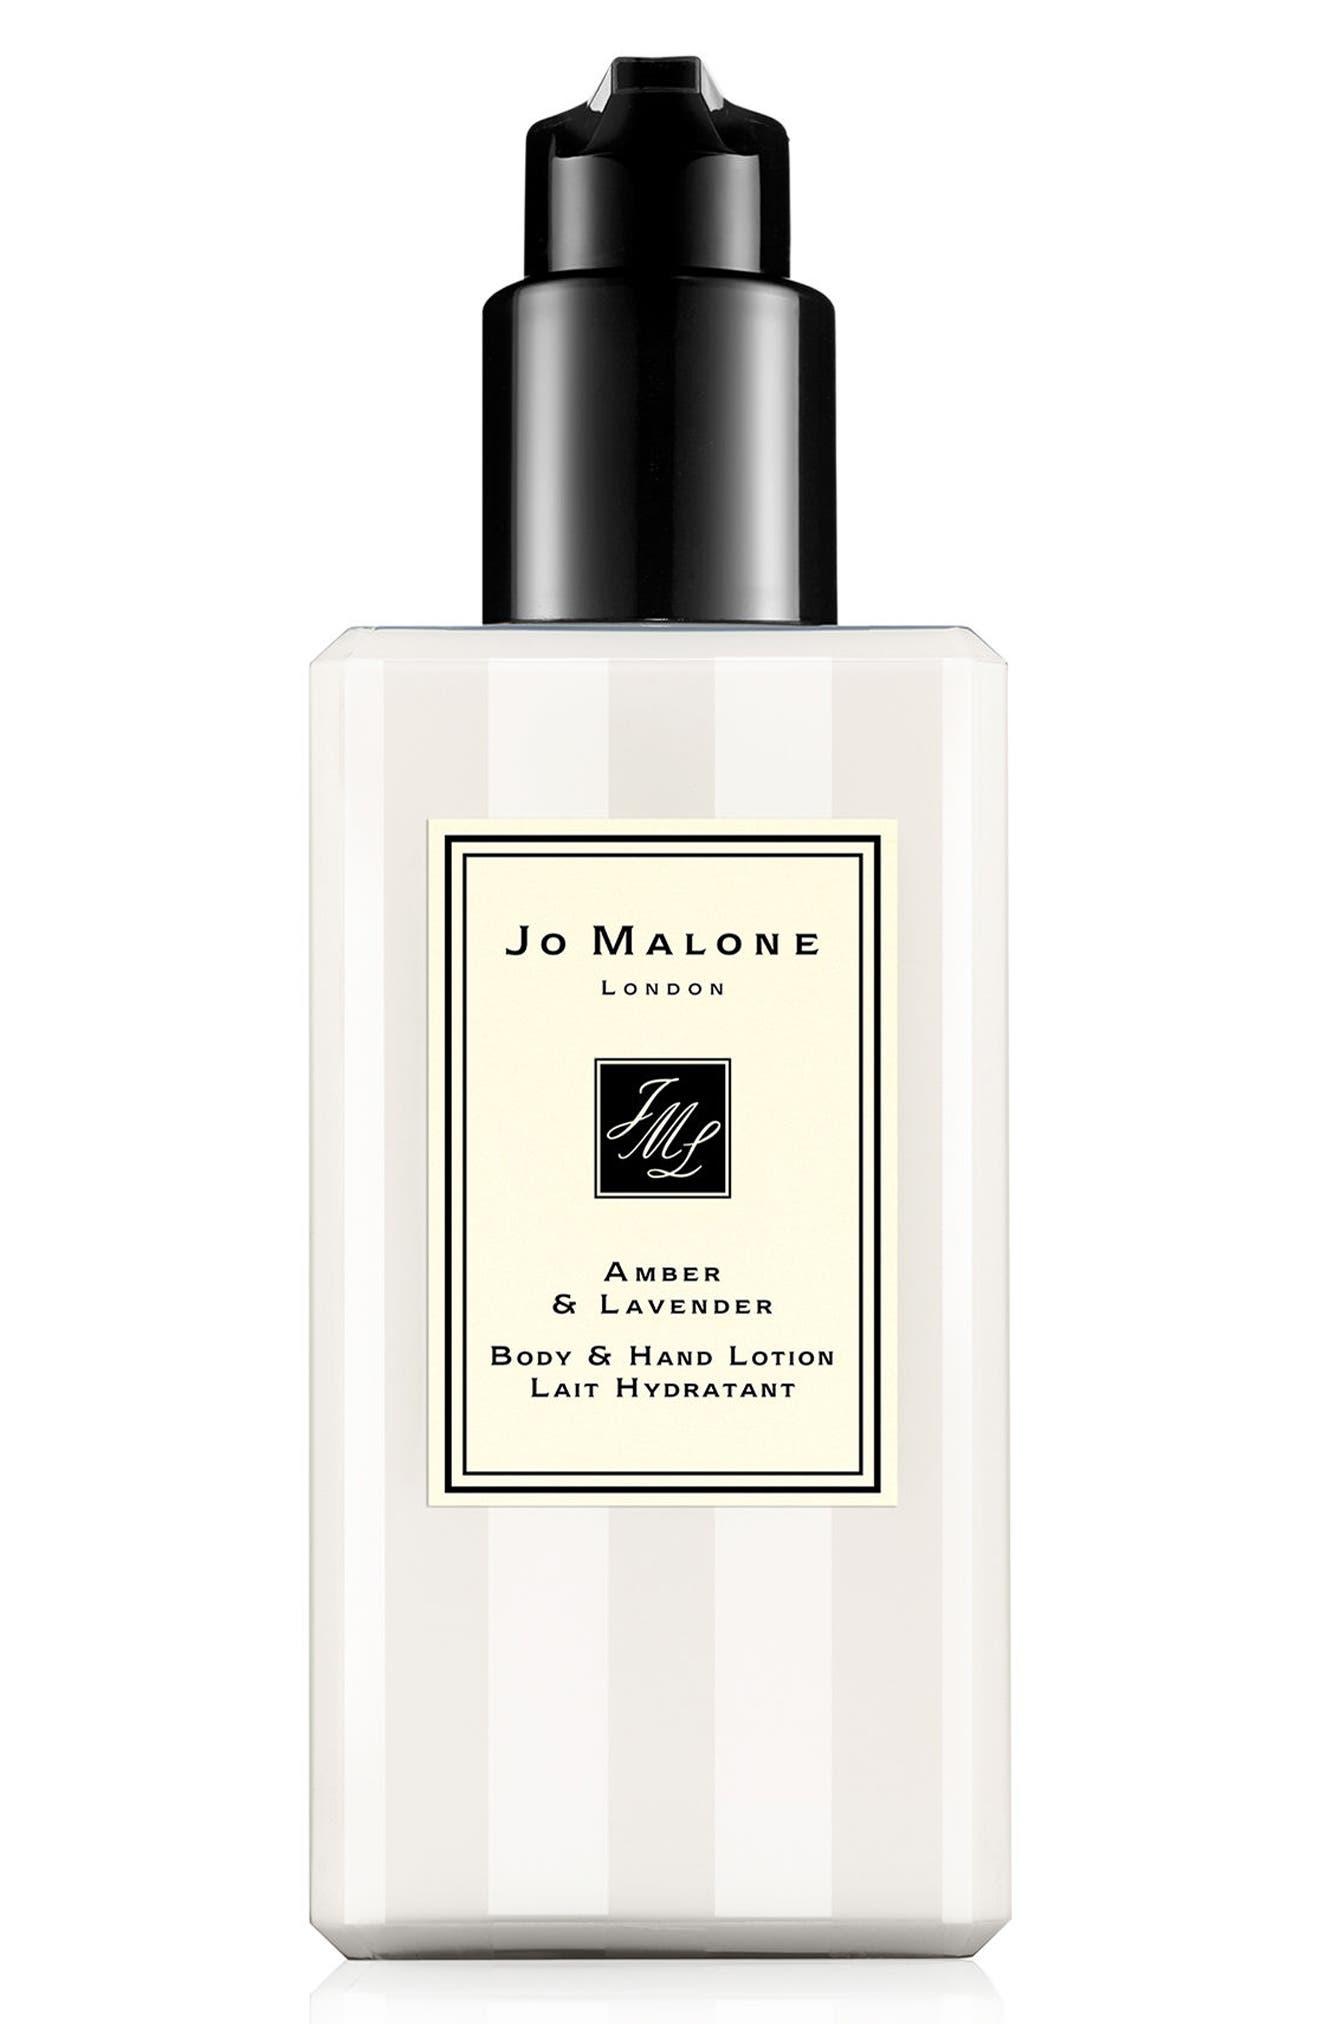 Jo Malone London™ 'Amber & Lavender' Body Lotion